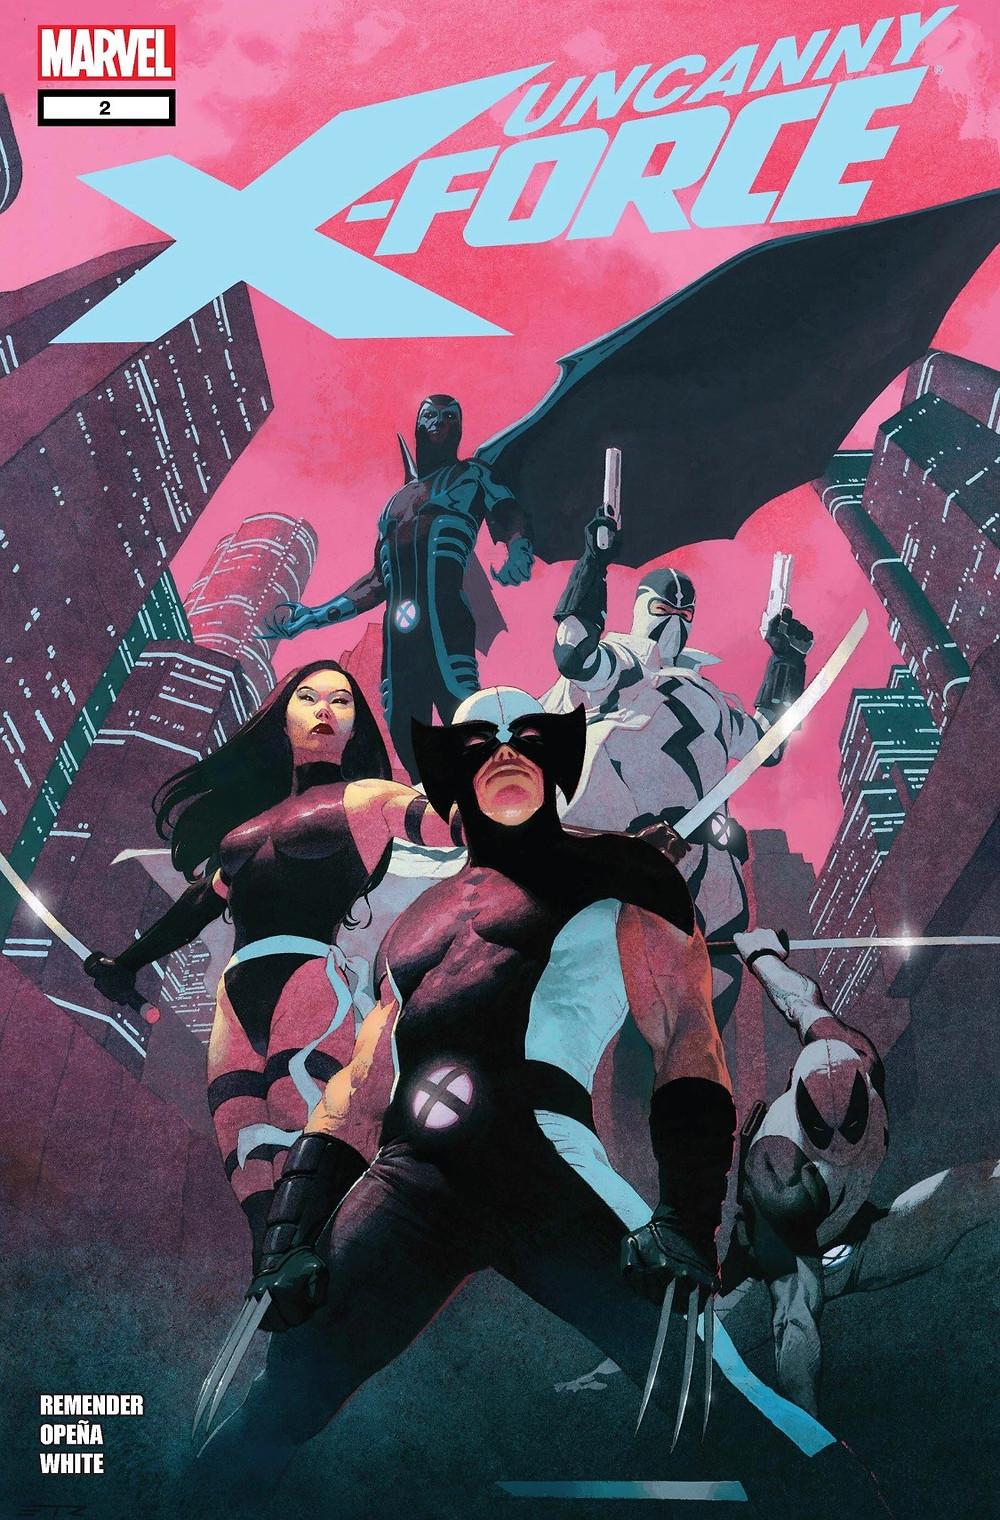 Uncanny X-Force #2, cover, Marvel Comics, Remender/Opeña